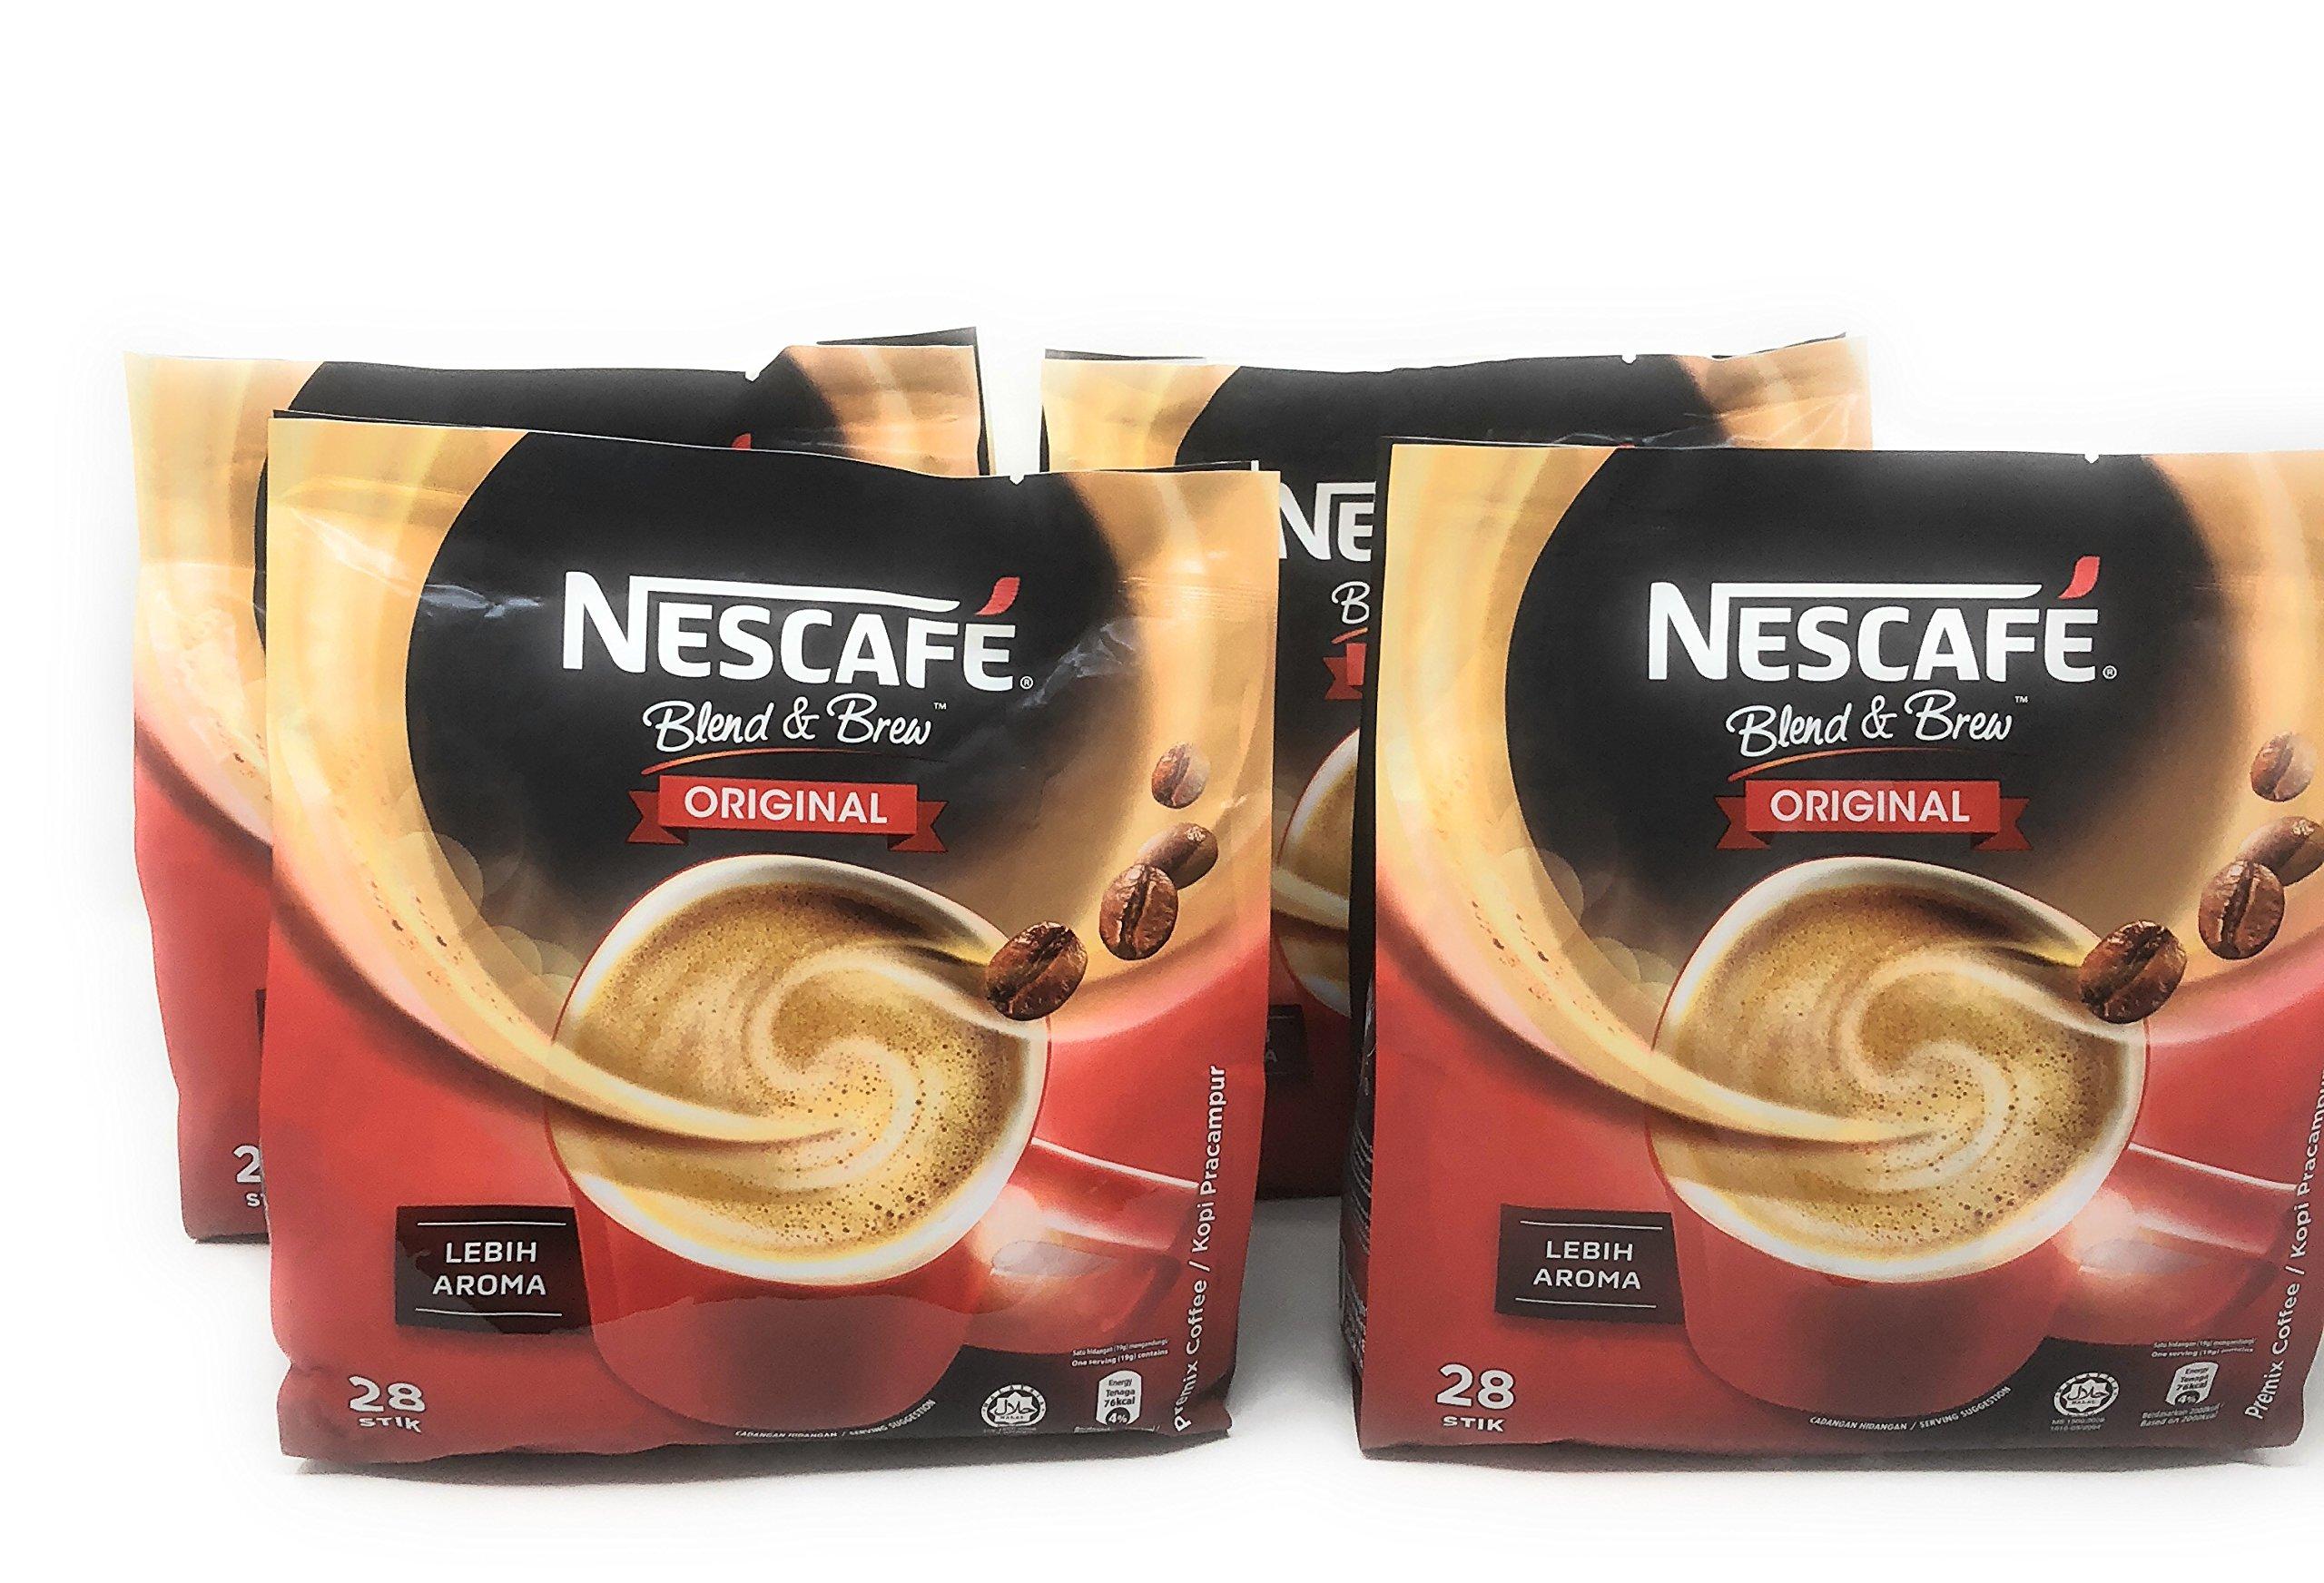 4 Packs Nescafé 3-in-1 ORIGINAL Premix Instant Coffee Single Serve Packets - Total 112 Sticks